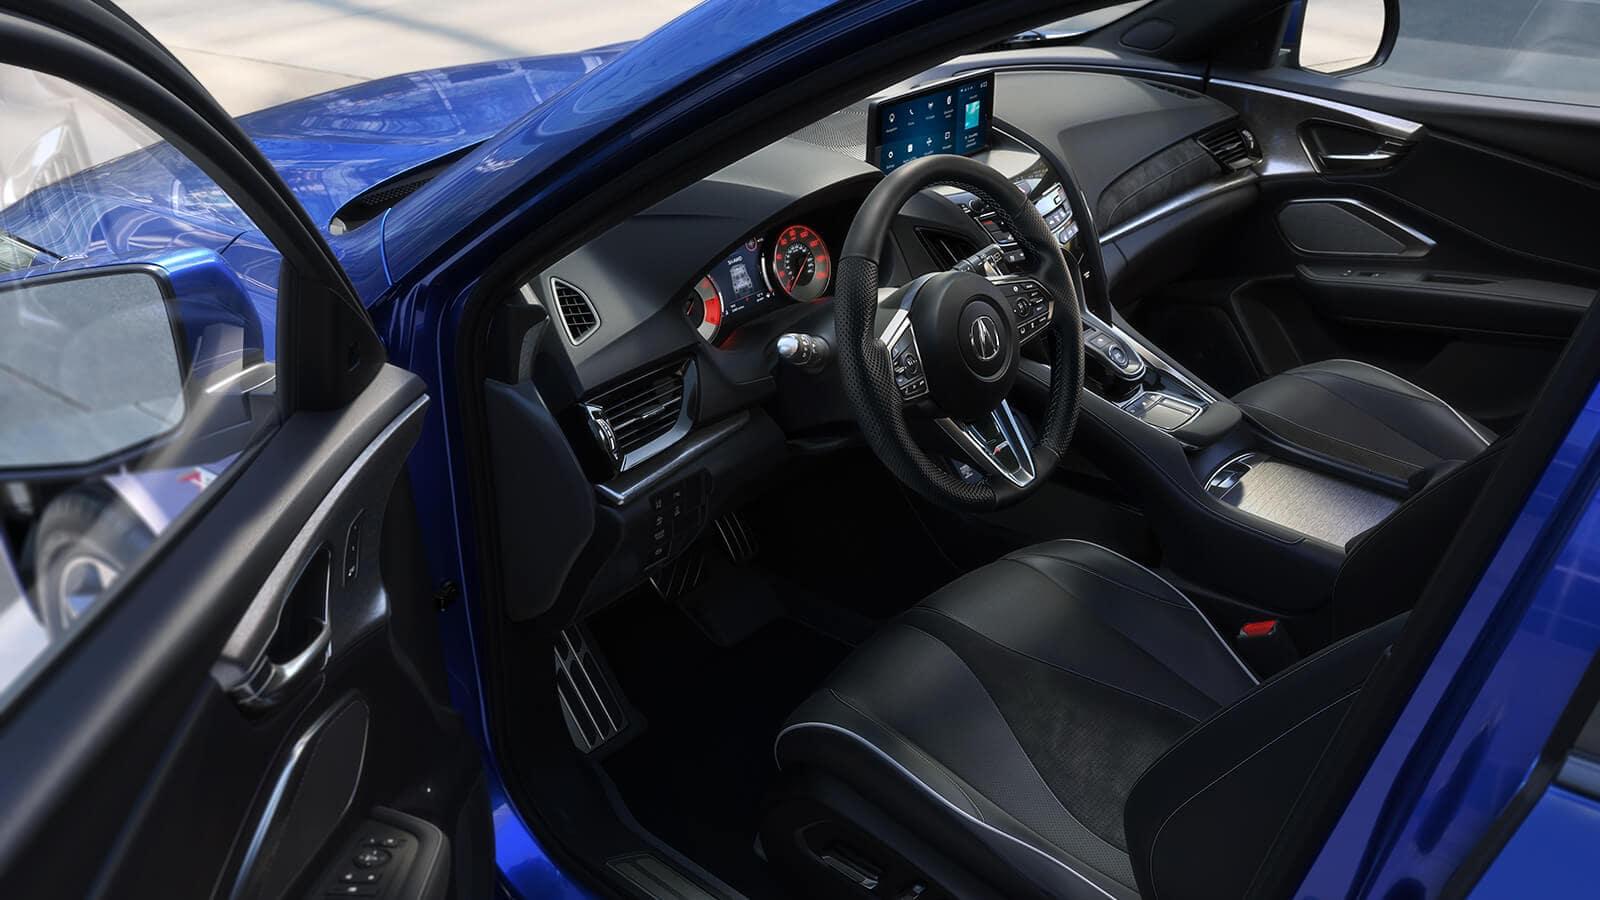 2020 Acura RDX Interior Cockpit Driver Side